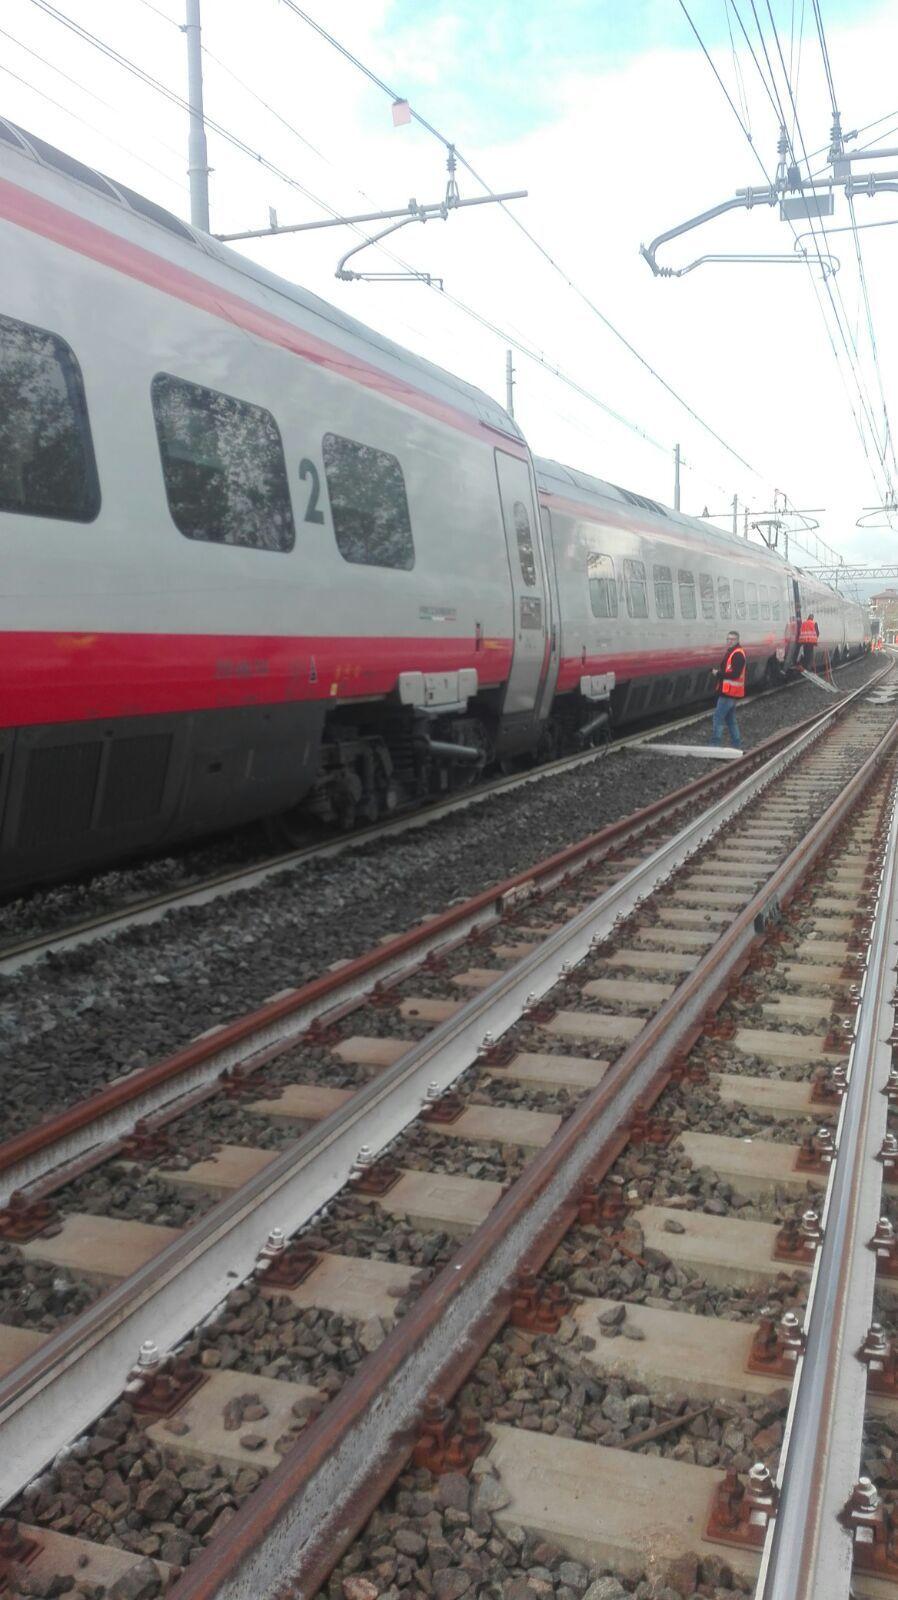 Vettura treno Av svia binari a Firenze